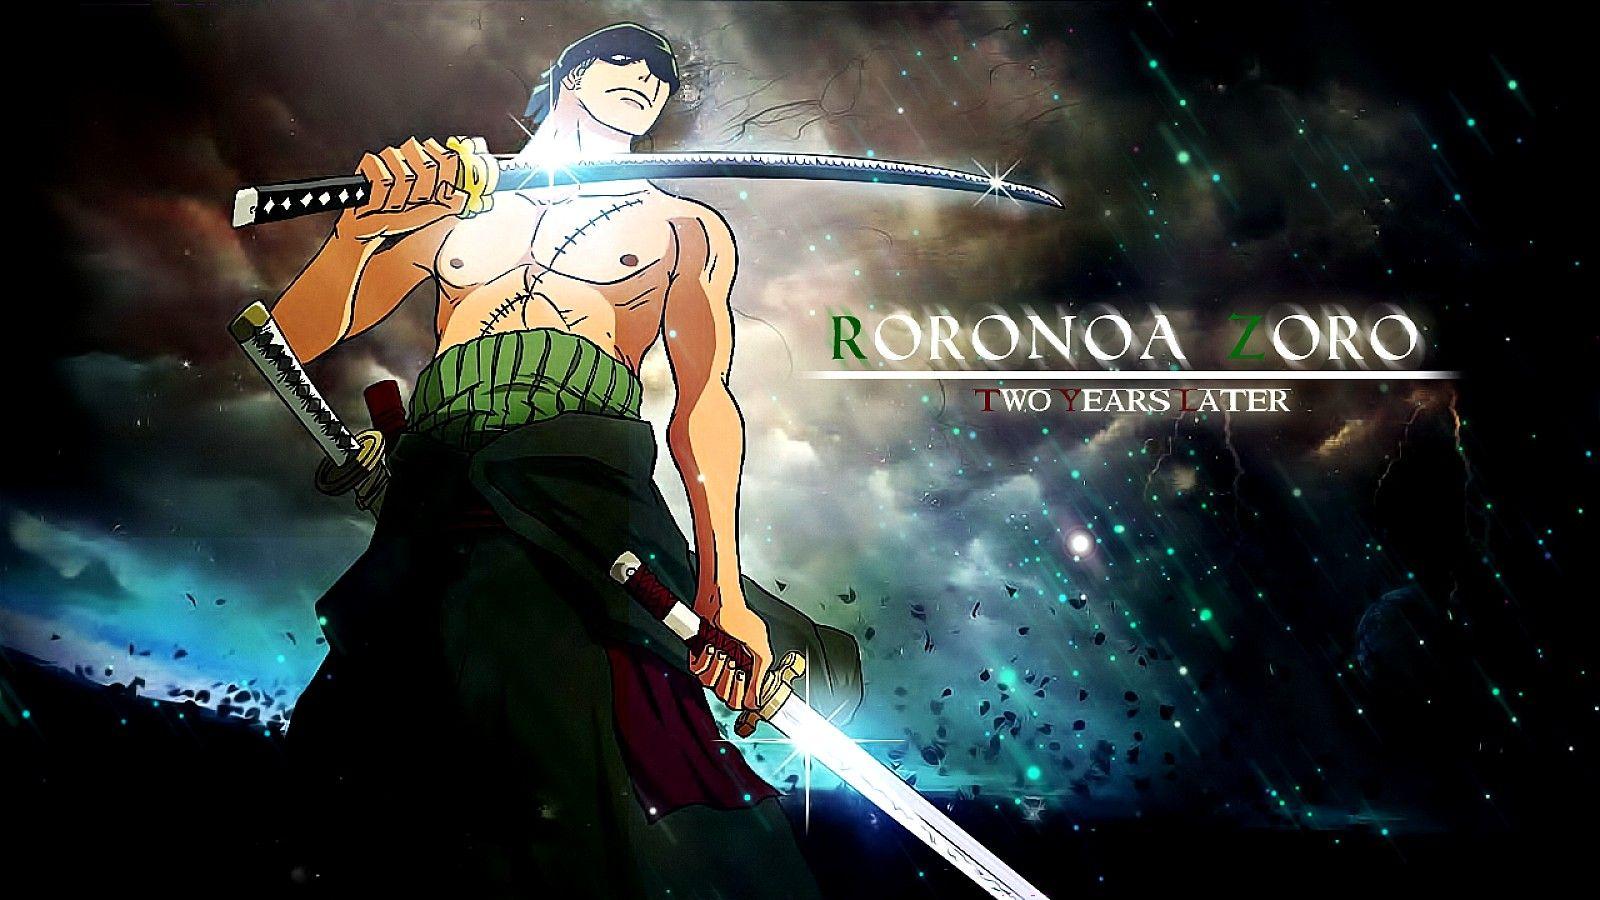 Zoro Roronoa One Piece Pinterest Persona Roronoa Zoro And Anime